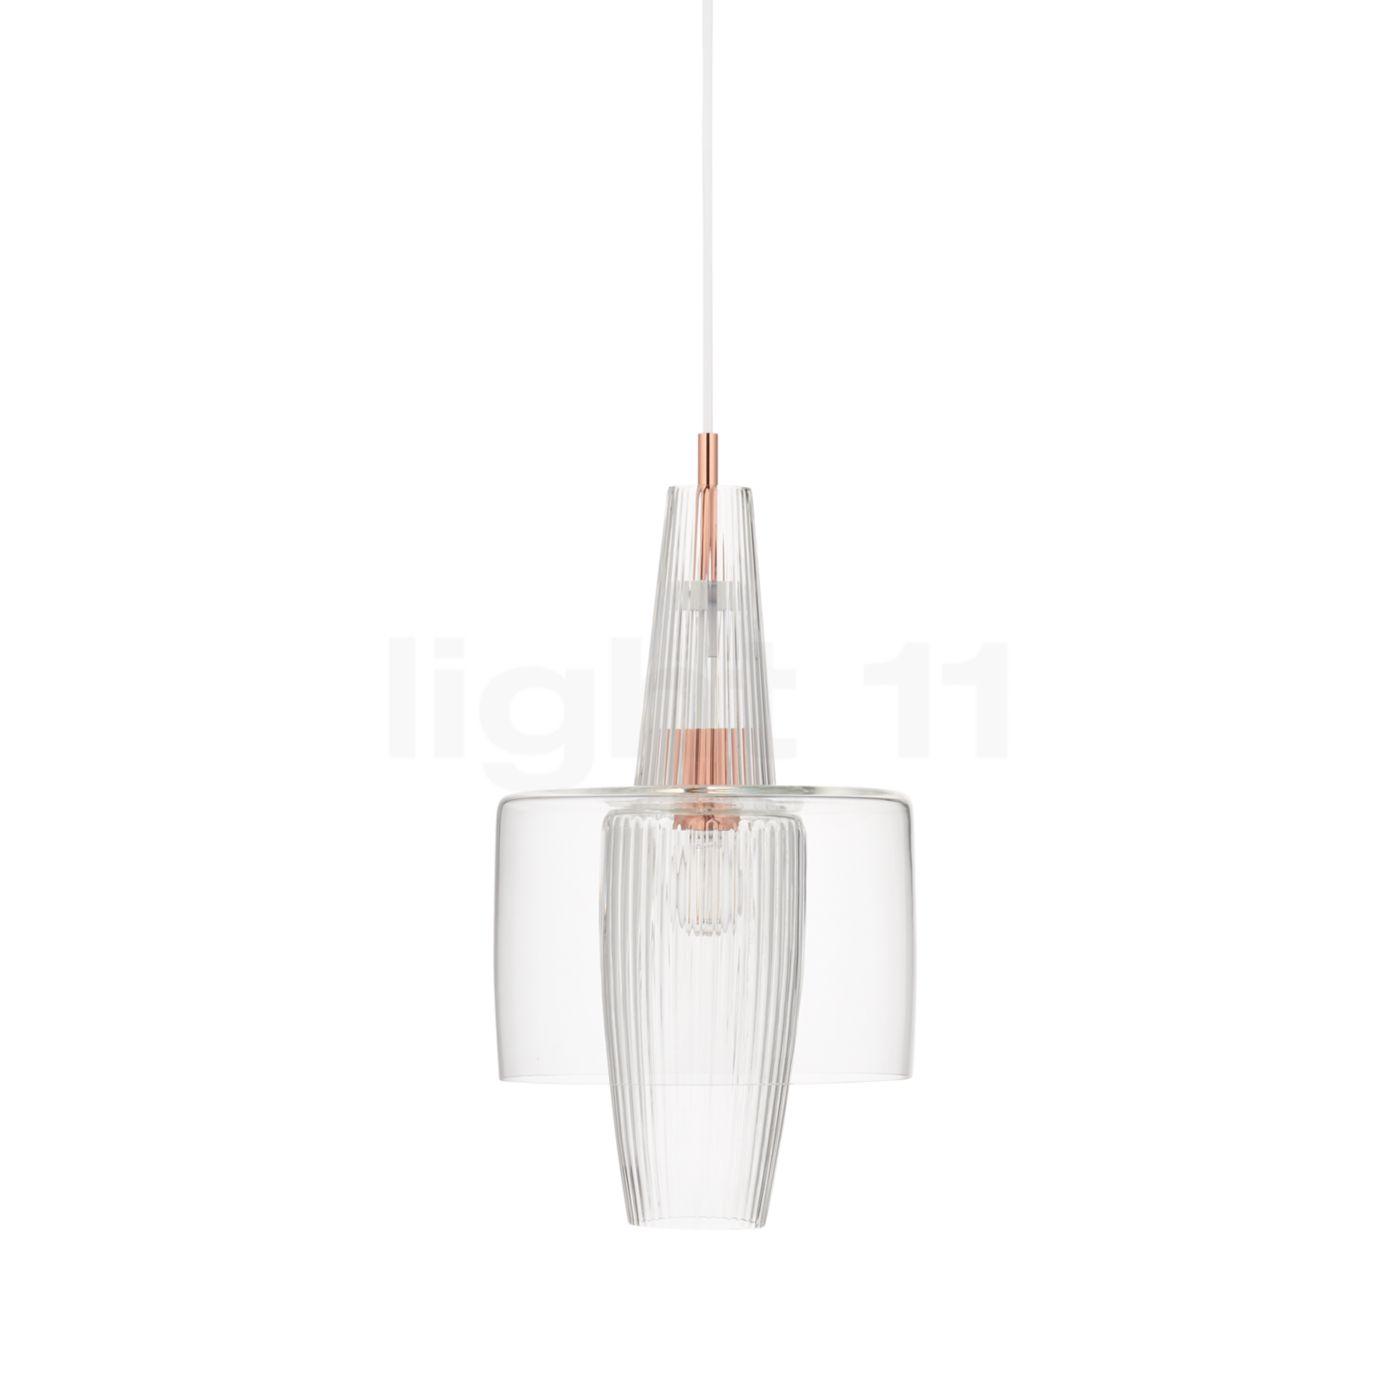 Mawa Gangkofner Venezia Pendelleuchte kristall, transparent, Kabel weiß/Rosé gk-ven-cc-9016-rg2-wt